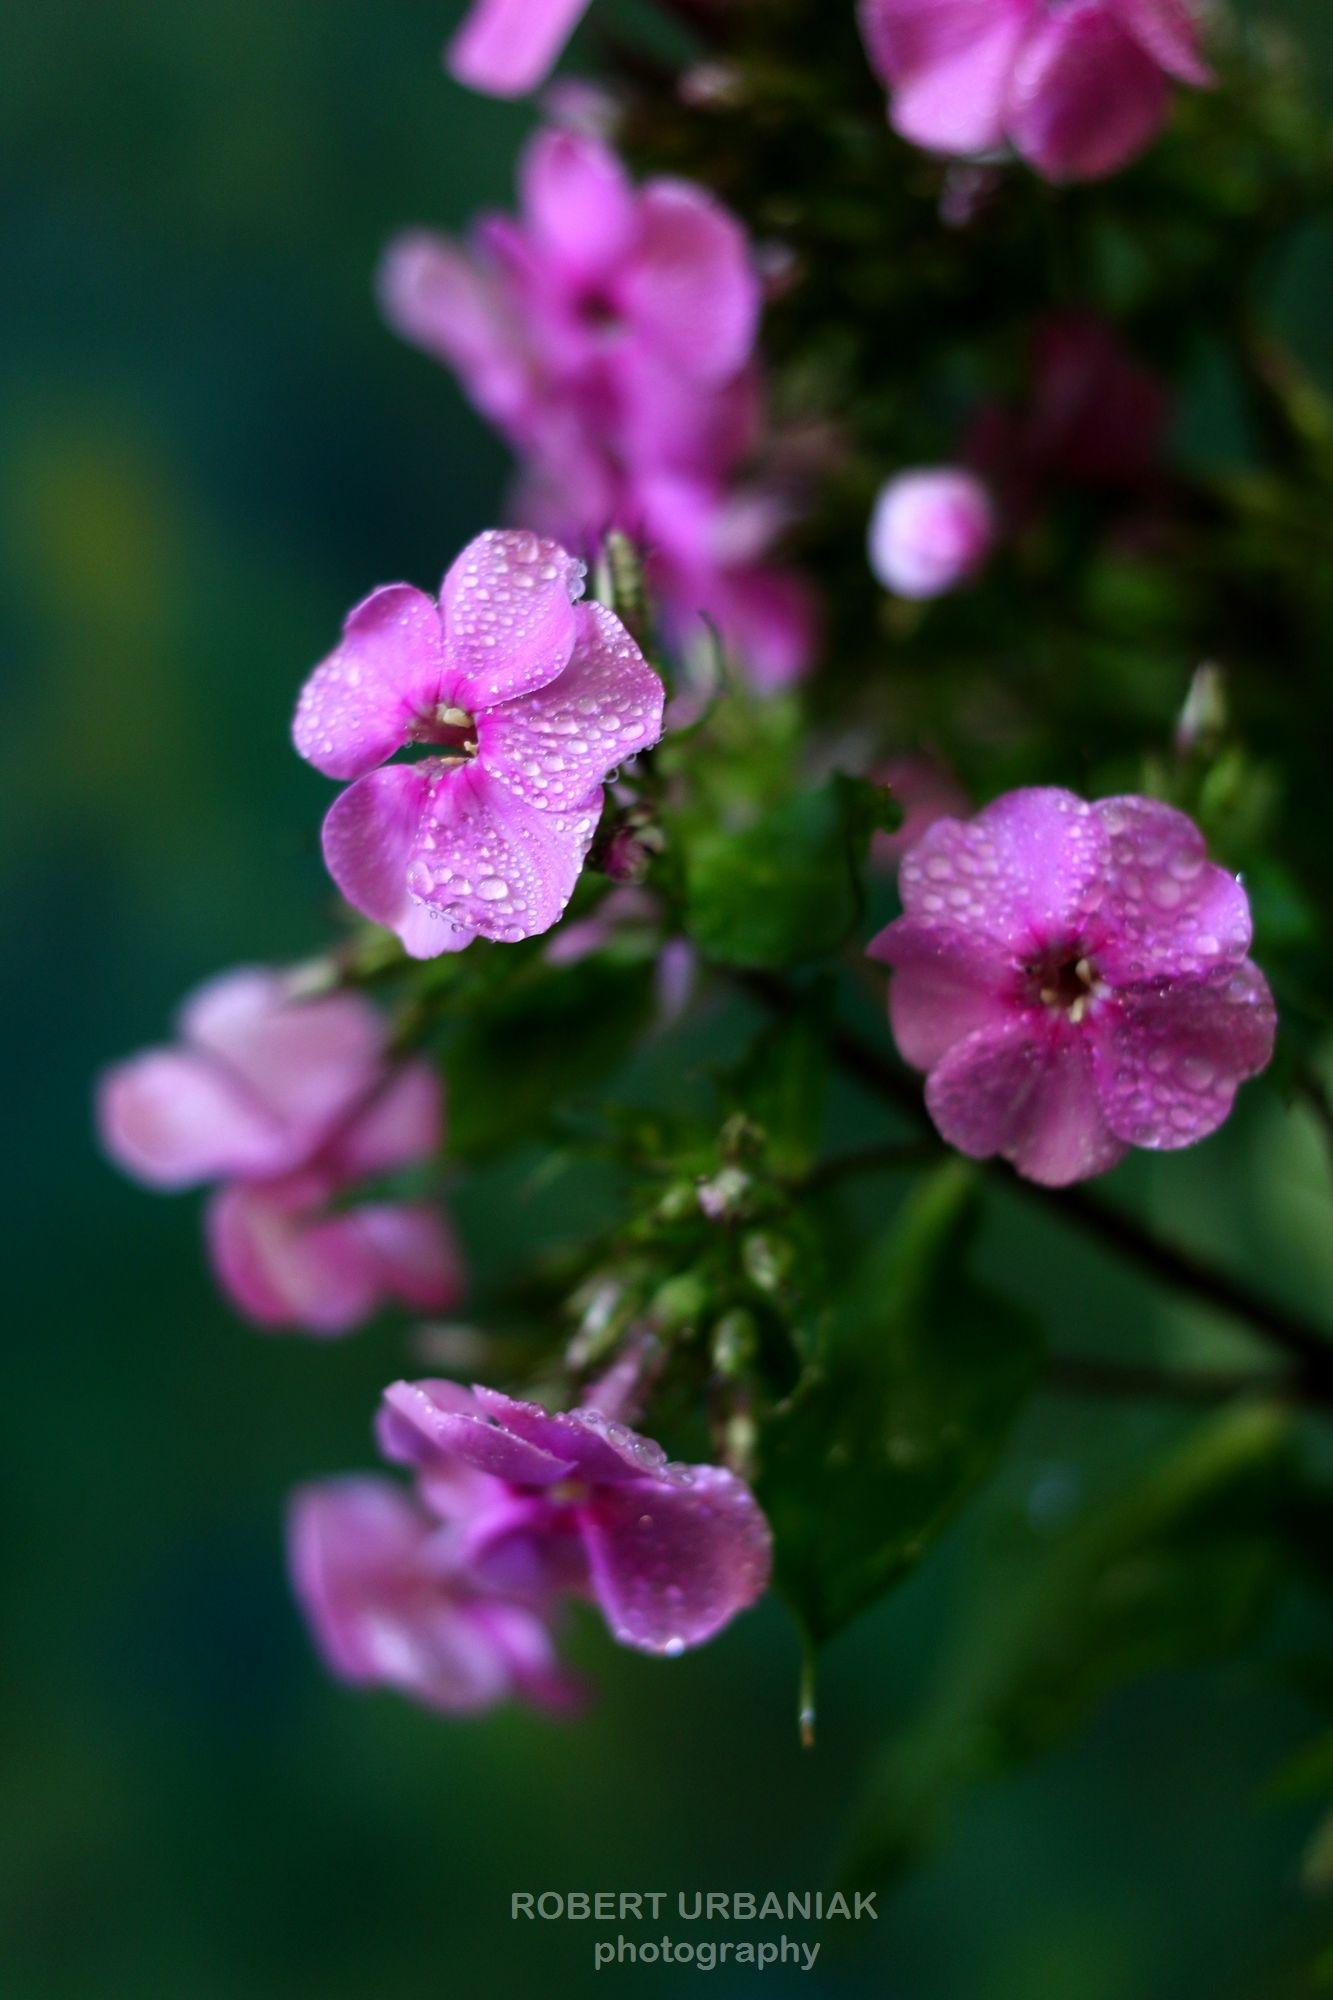 purple with drops3 by Robert Urbaniak